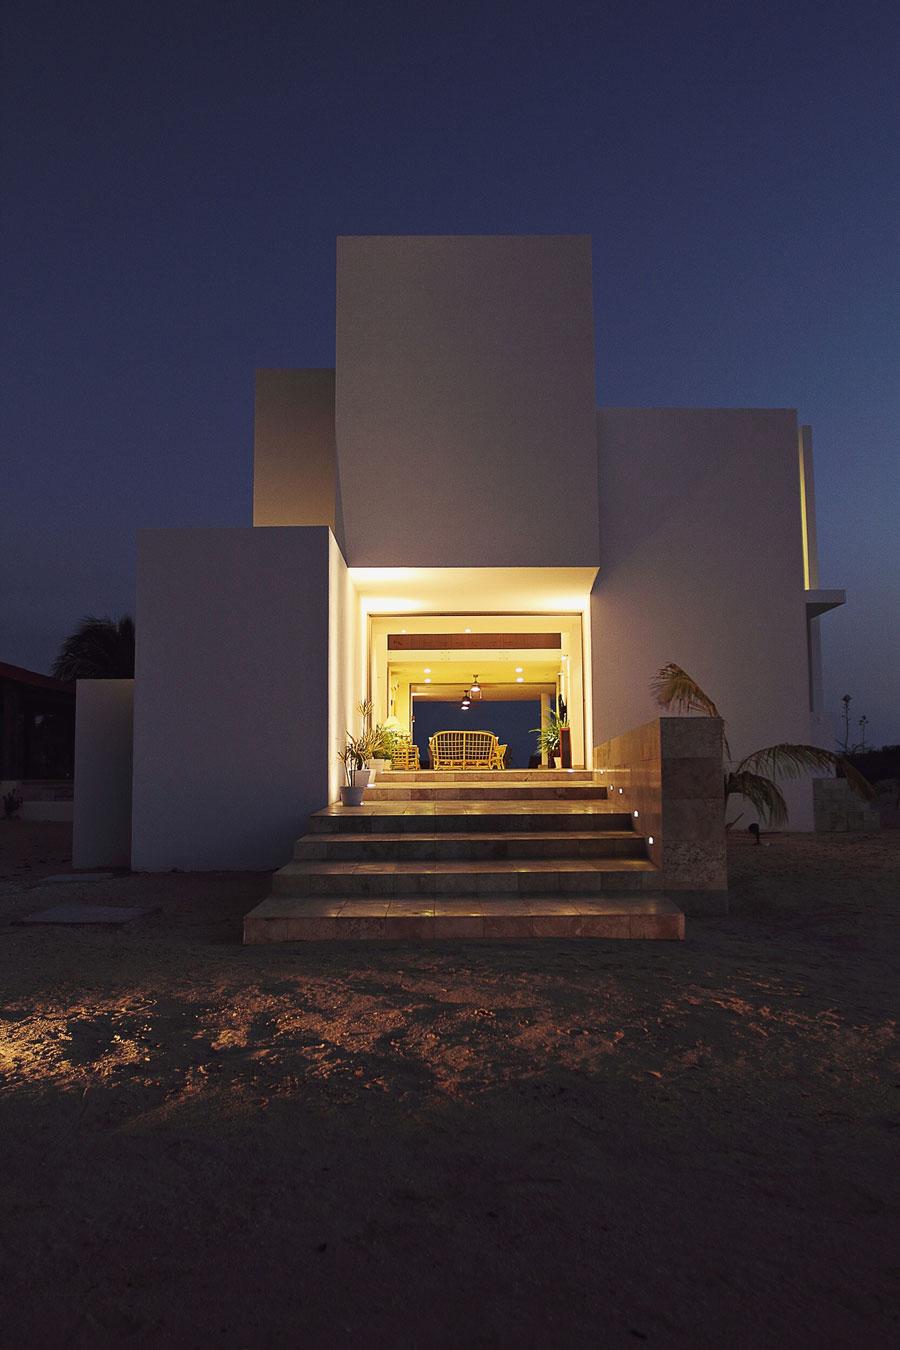 Entrance, Steps, Lighting, Tuunich Kanab in San Bruno, Mexico by Seijo Peon Arquitectos